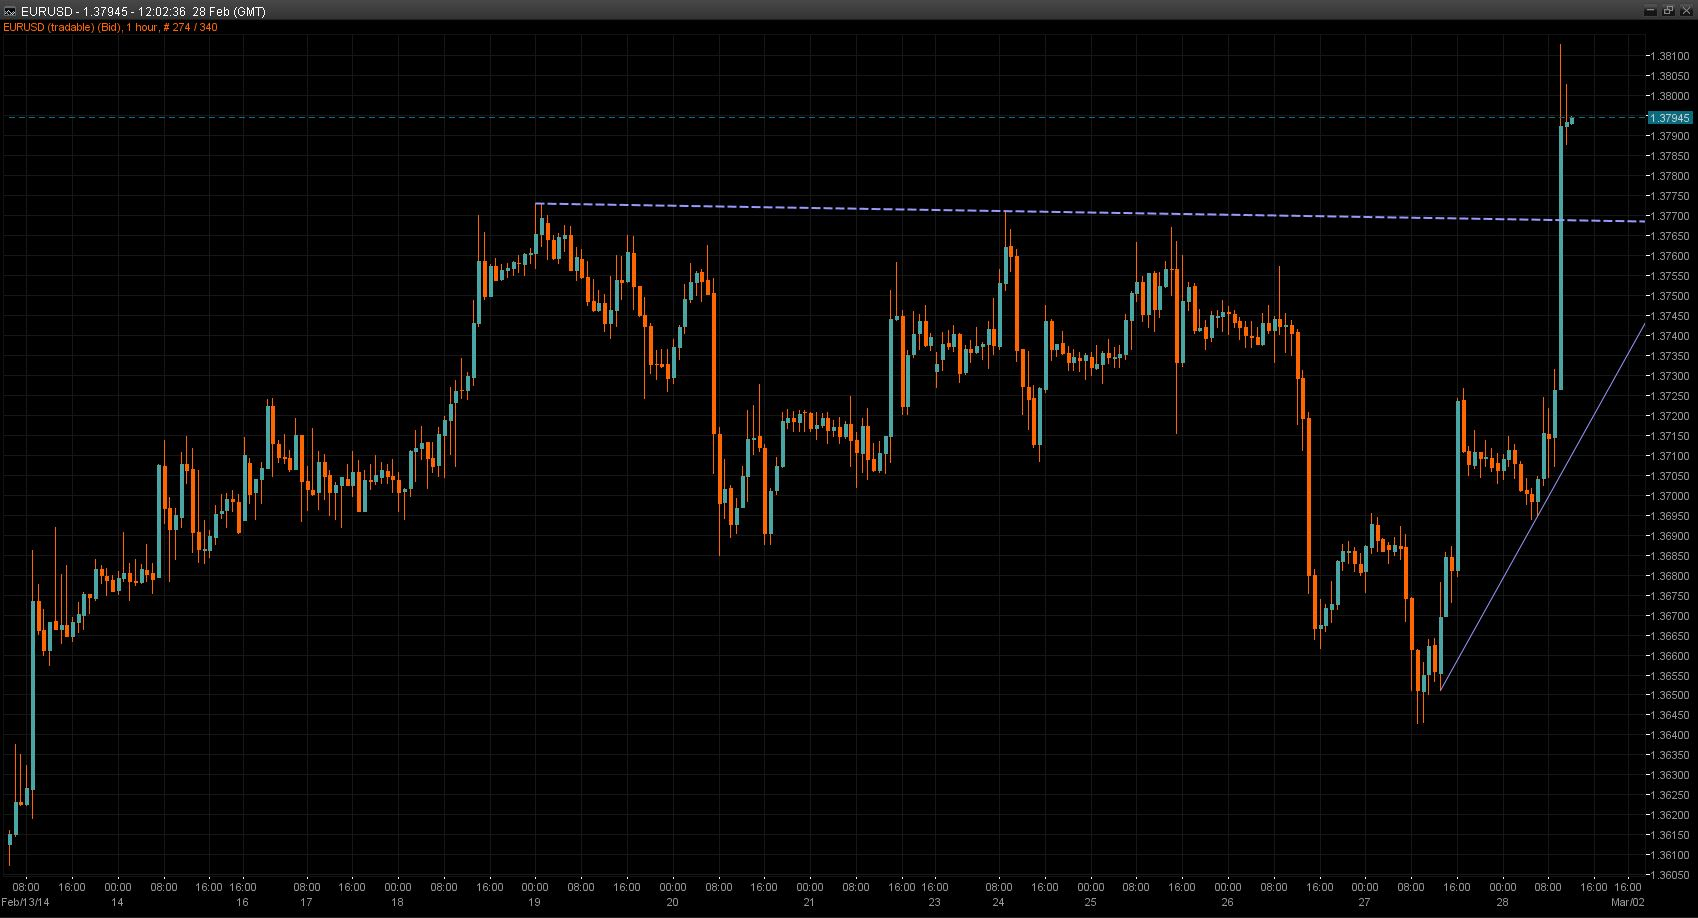 EUR/USD Chart 28 Feb 2014